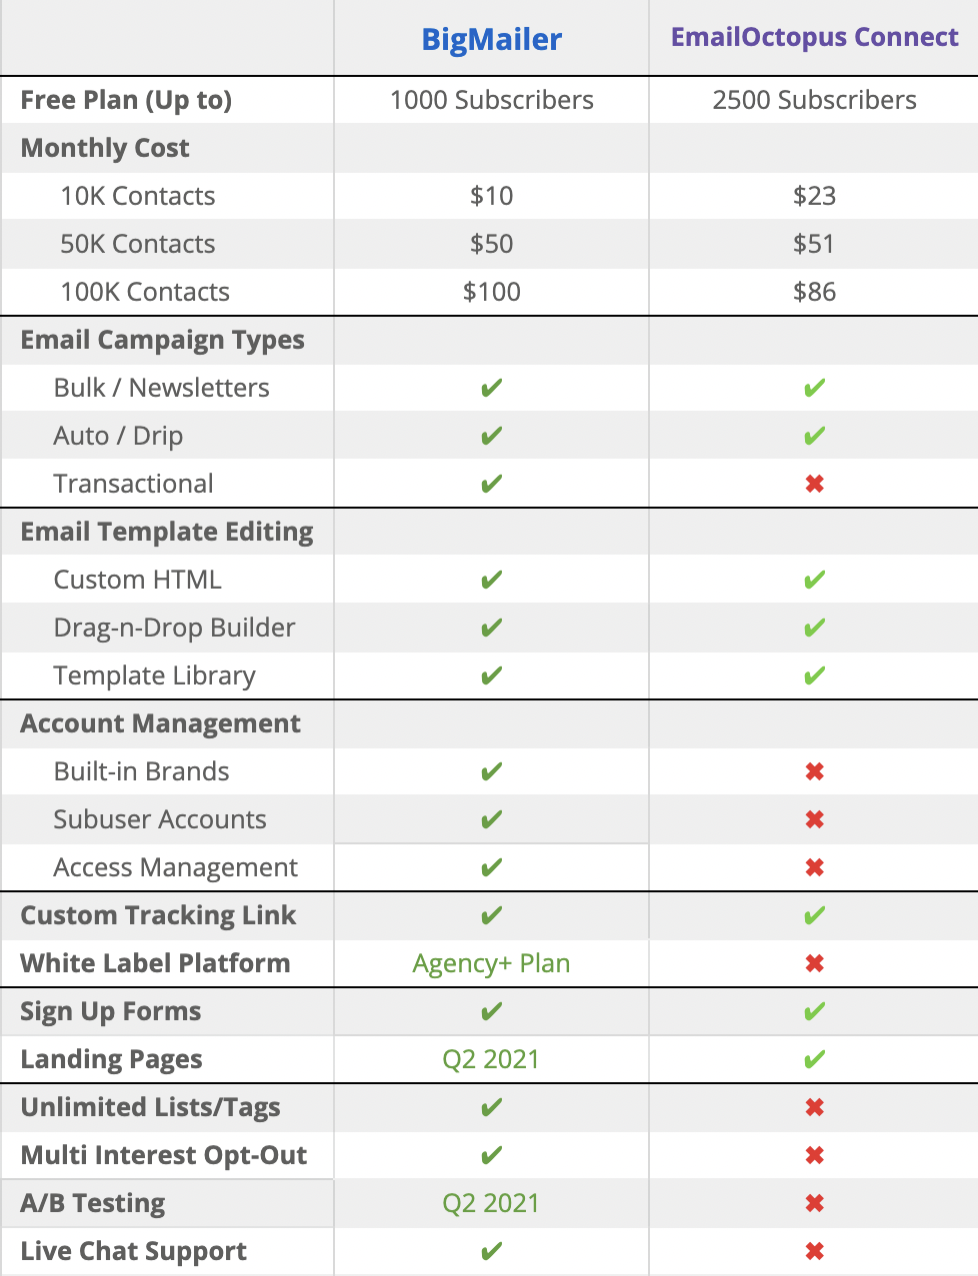 BigMailer vs EmailOctopus comparison table